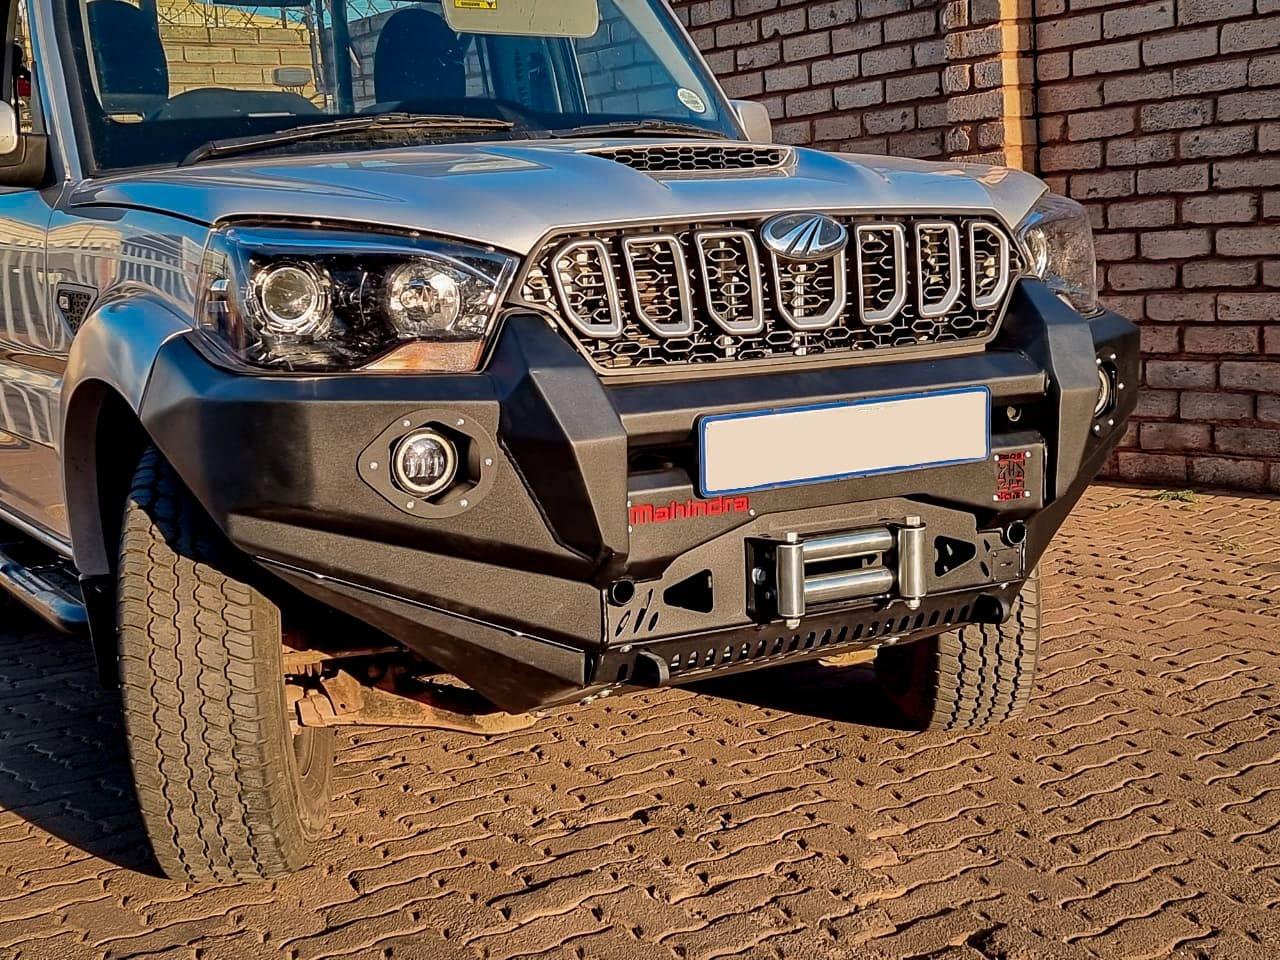 Mahindra Steel Replacement Bumper / Nudge Bar / Bull Bar